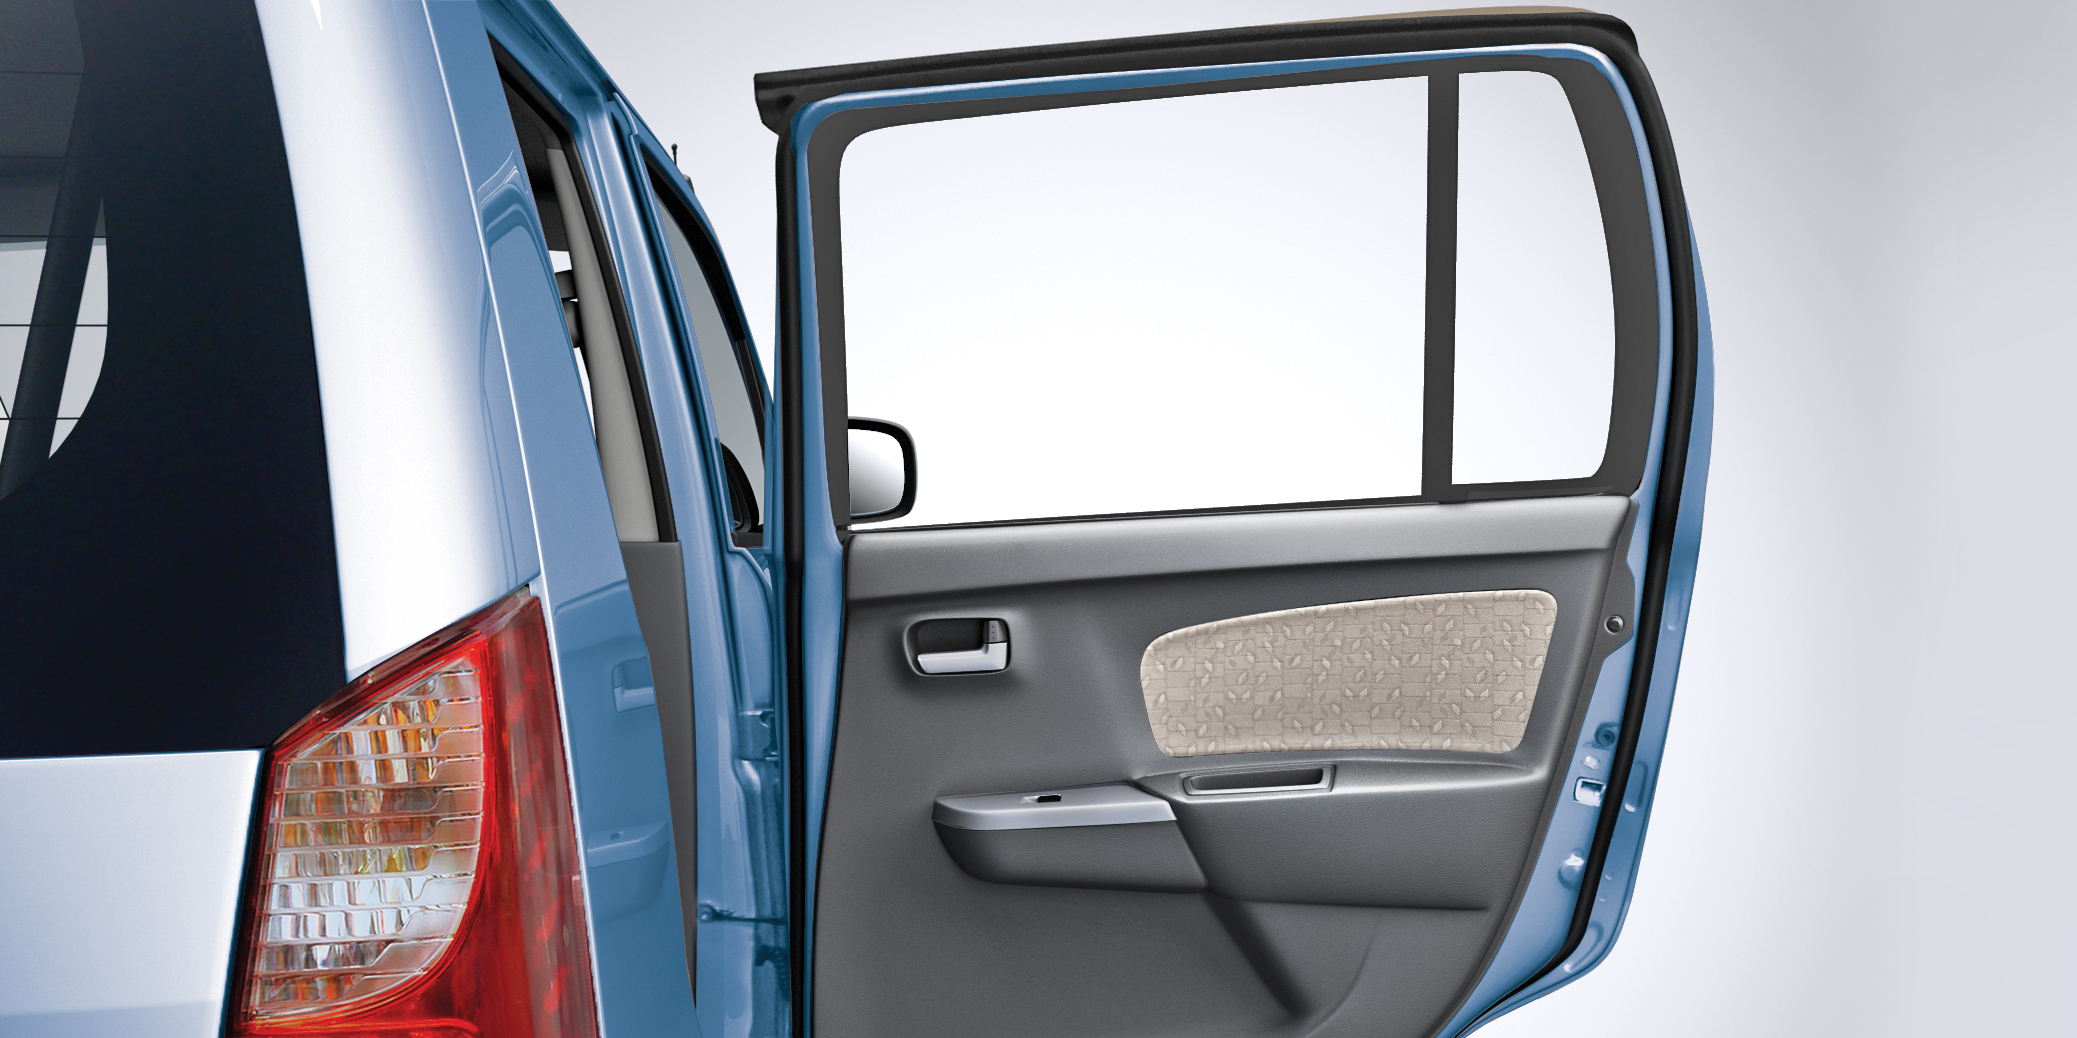 WagonR Interiors Pics – Wide Opening Doors